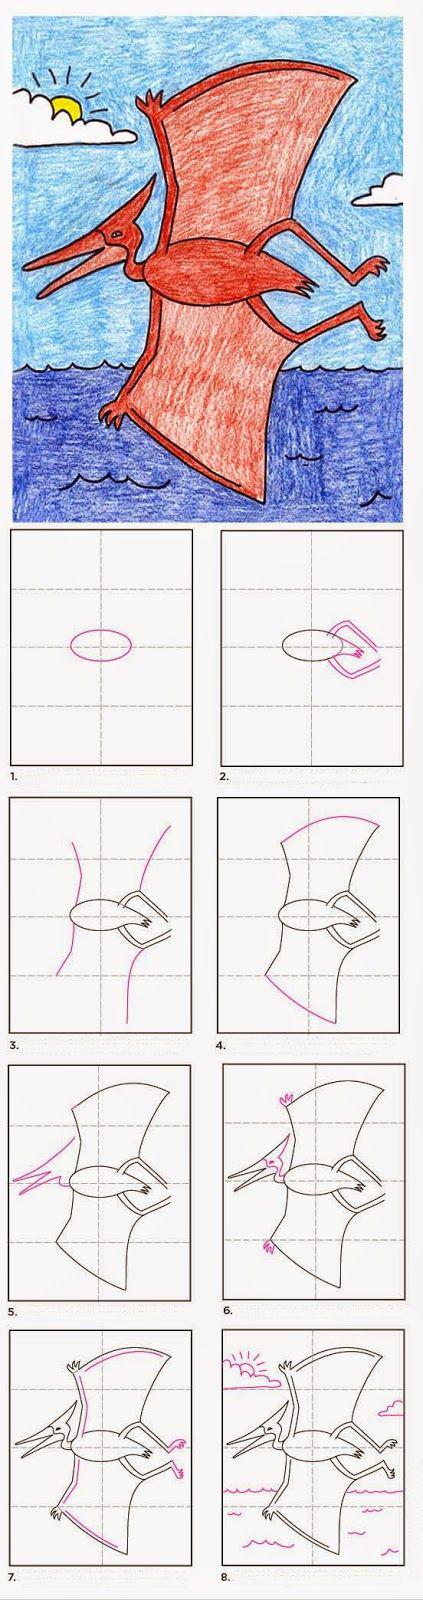 كيفية رسم ديناصور طائر